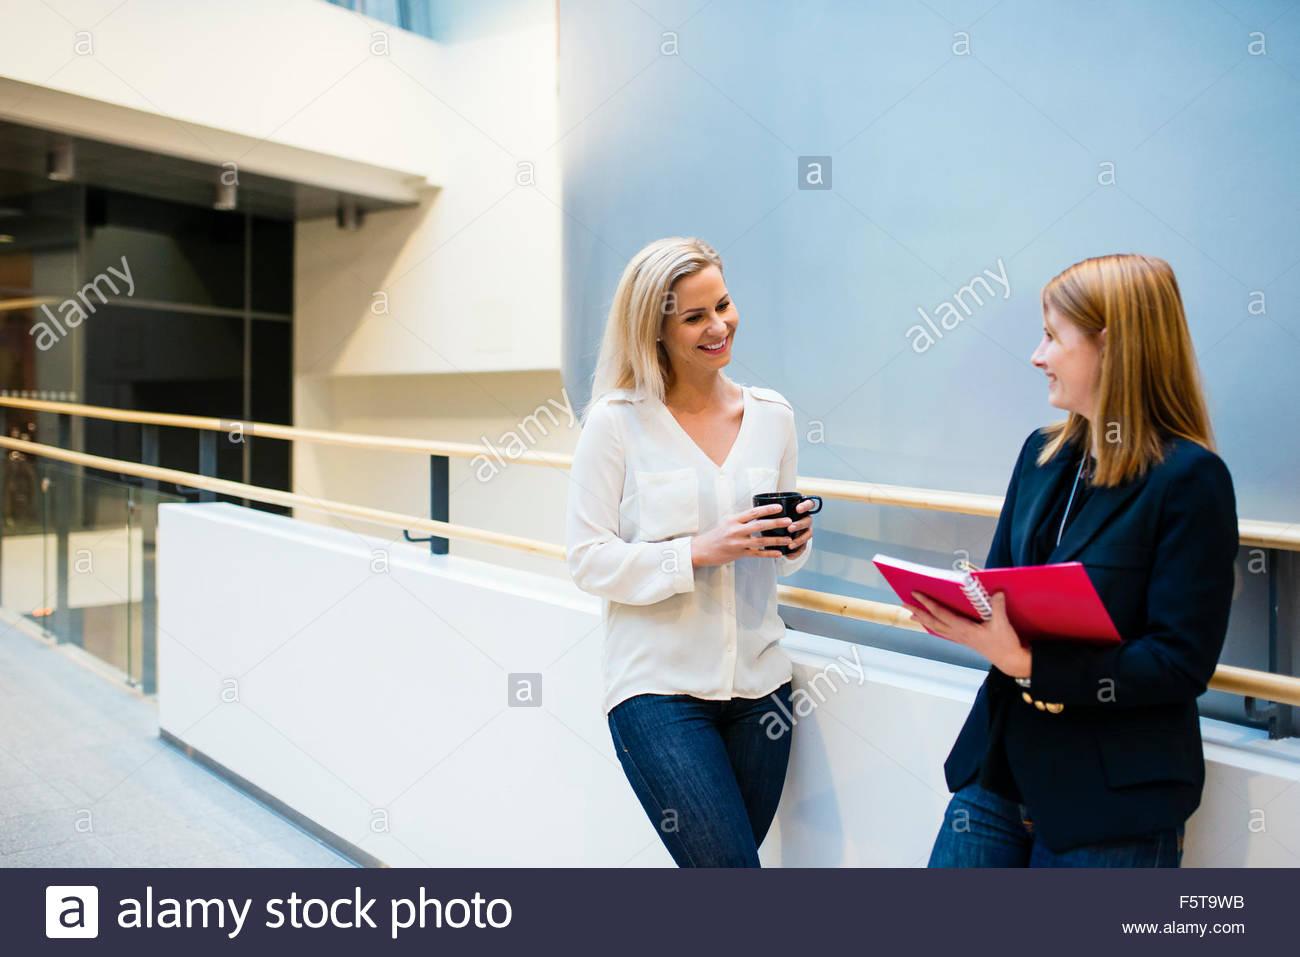 Finland, Two women talking in office corridor - Stock Image